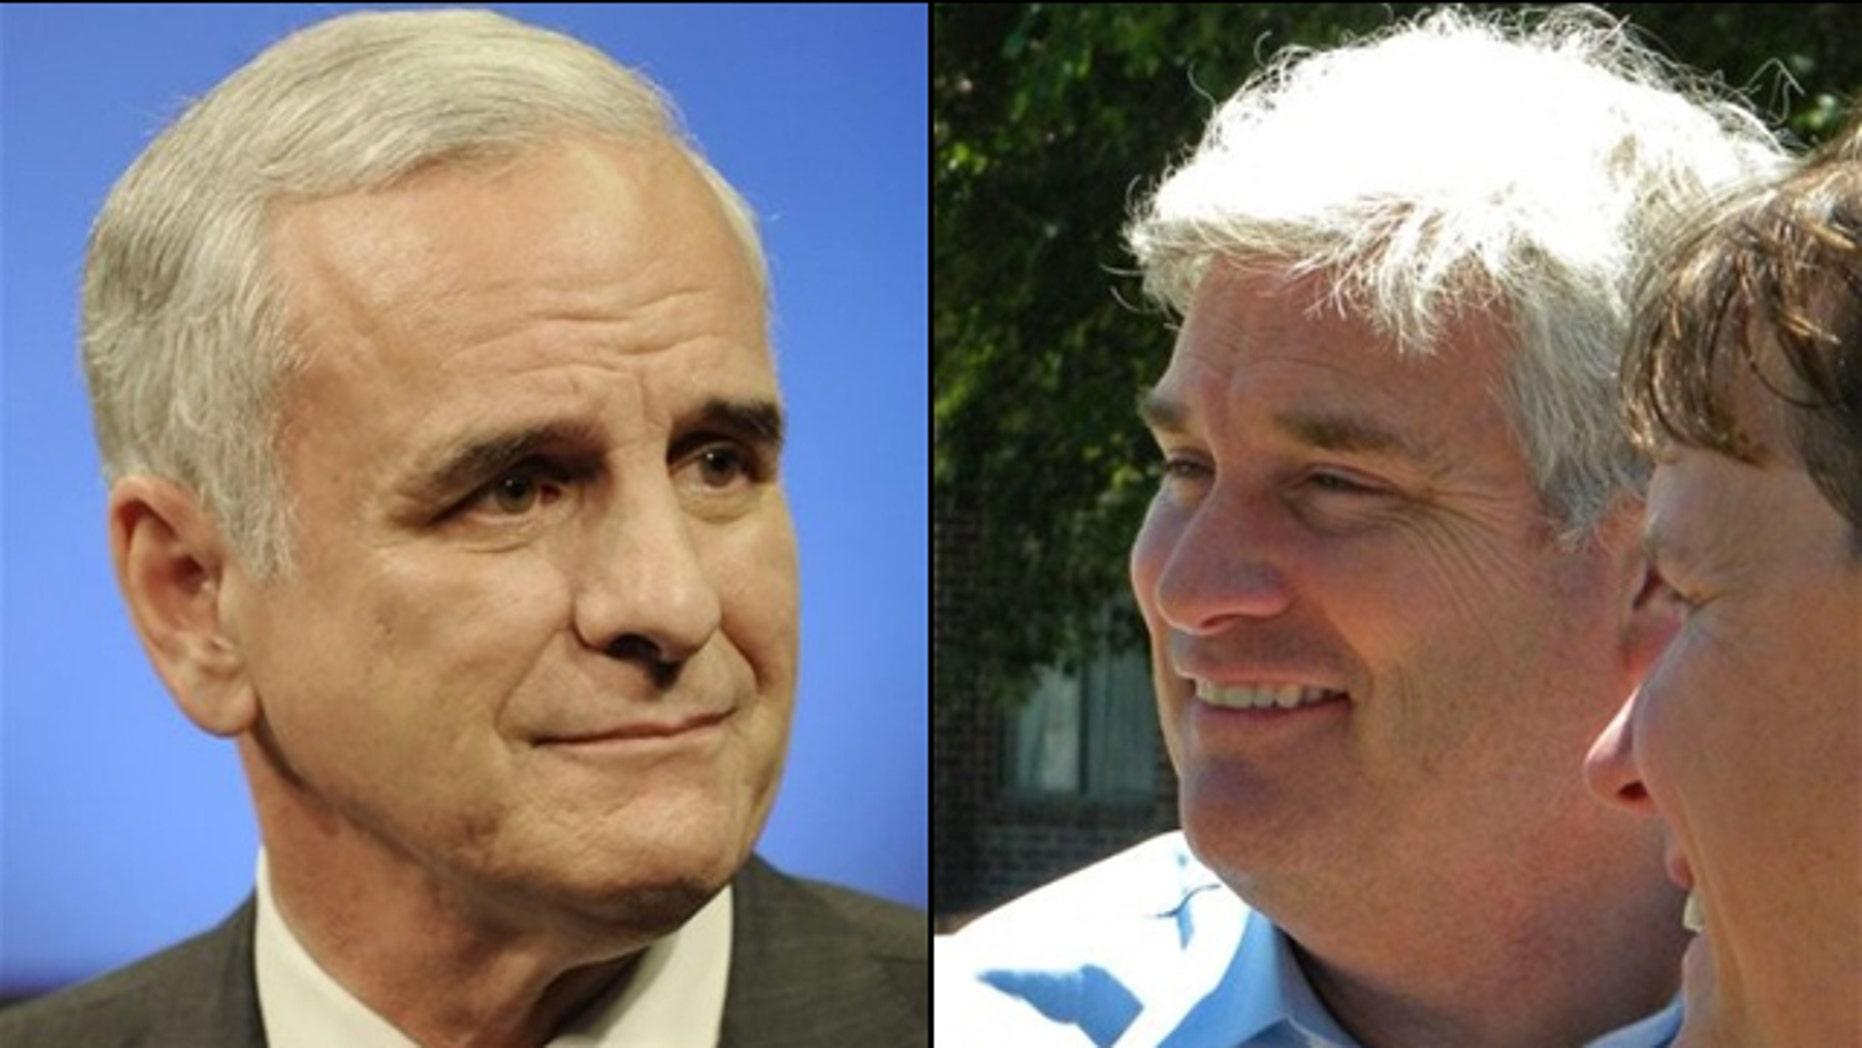 Democratic gubernatorial candidate Mark Dayton, (l), and Republican gubernatorial candidate Tom Emmer, (r) are seeking to become Minnesota's next governor. (AP)